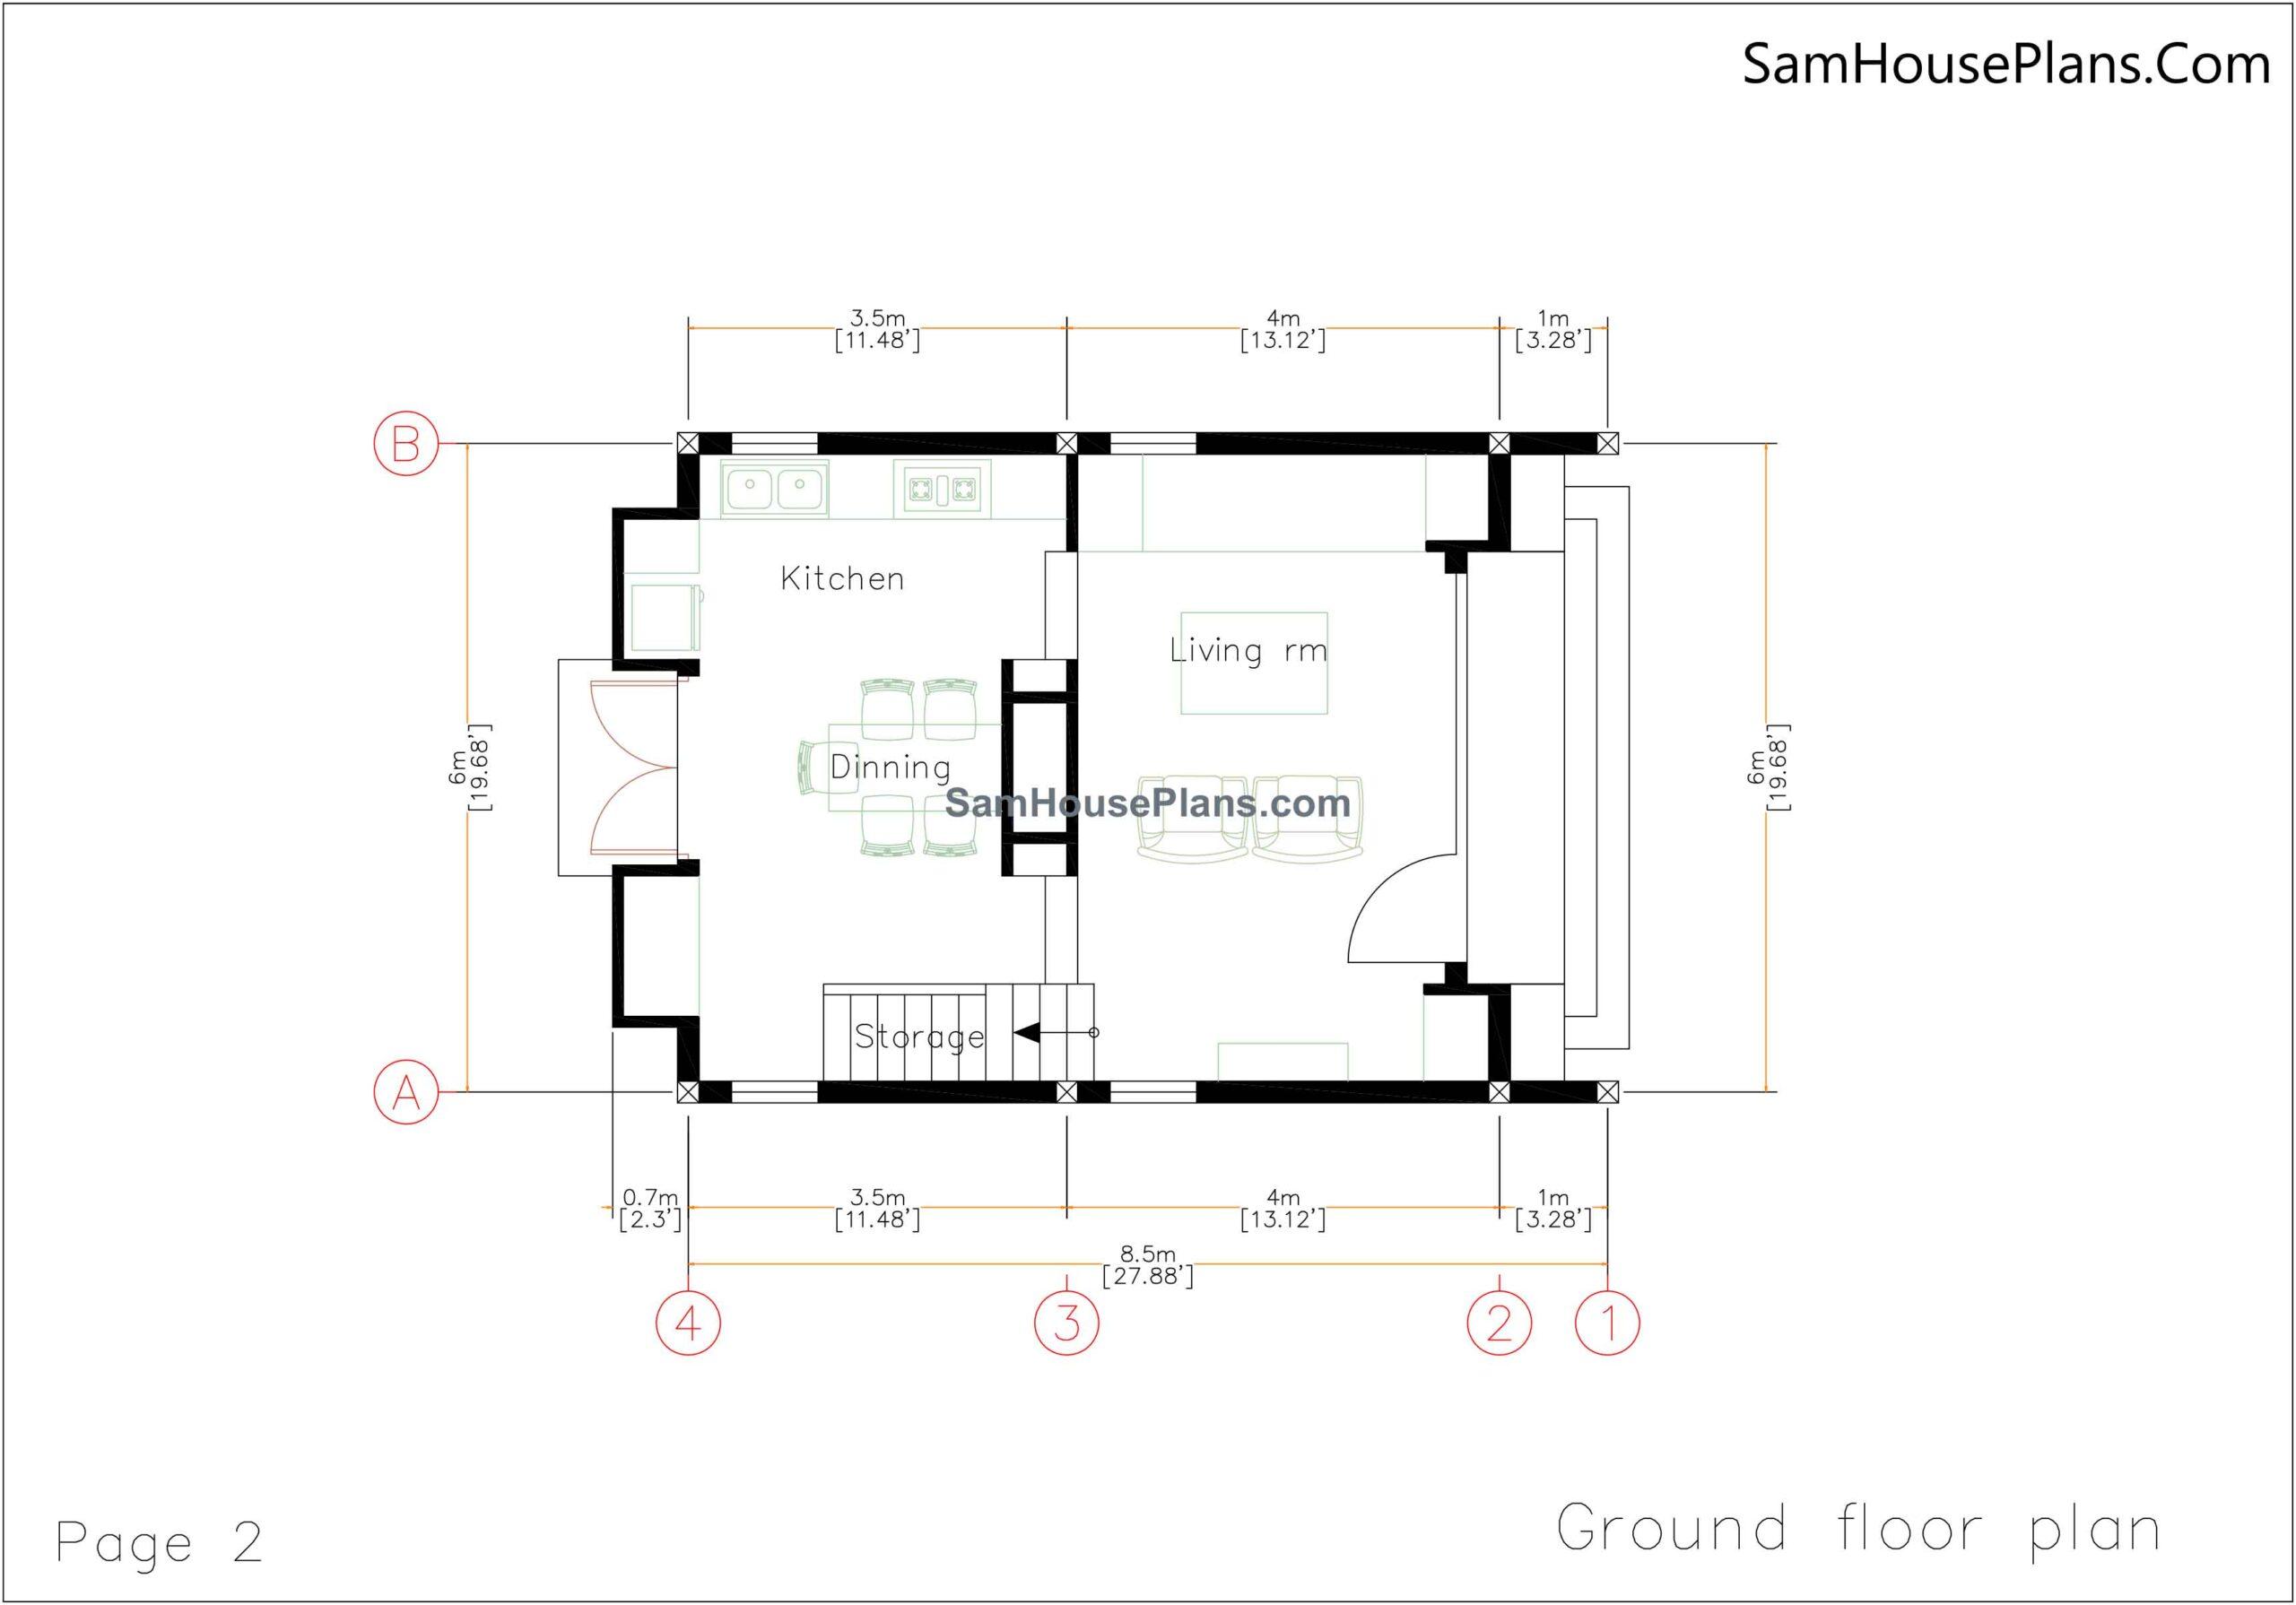 02 Ground Floor Plan 20x30 Small House Plan 6x8.5m